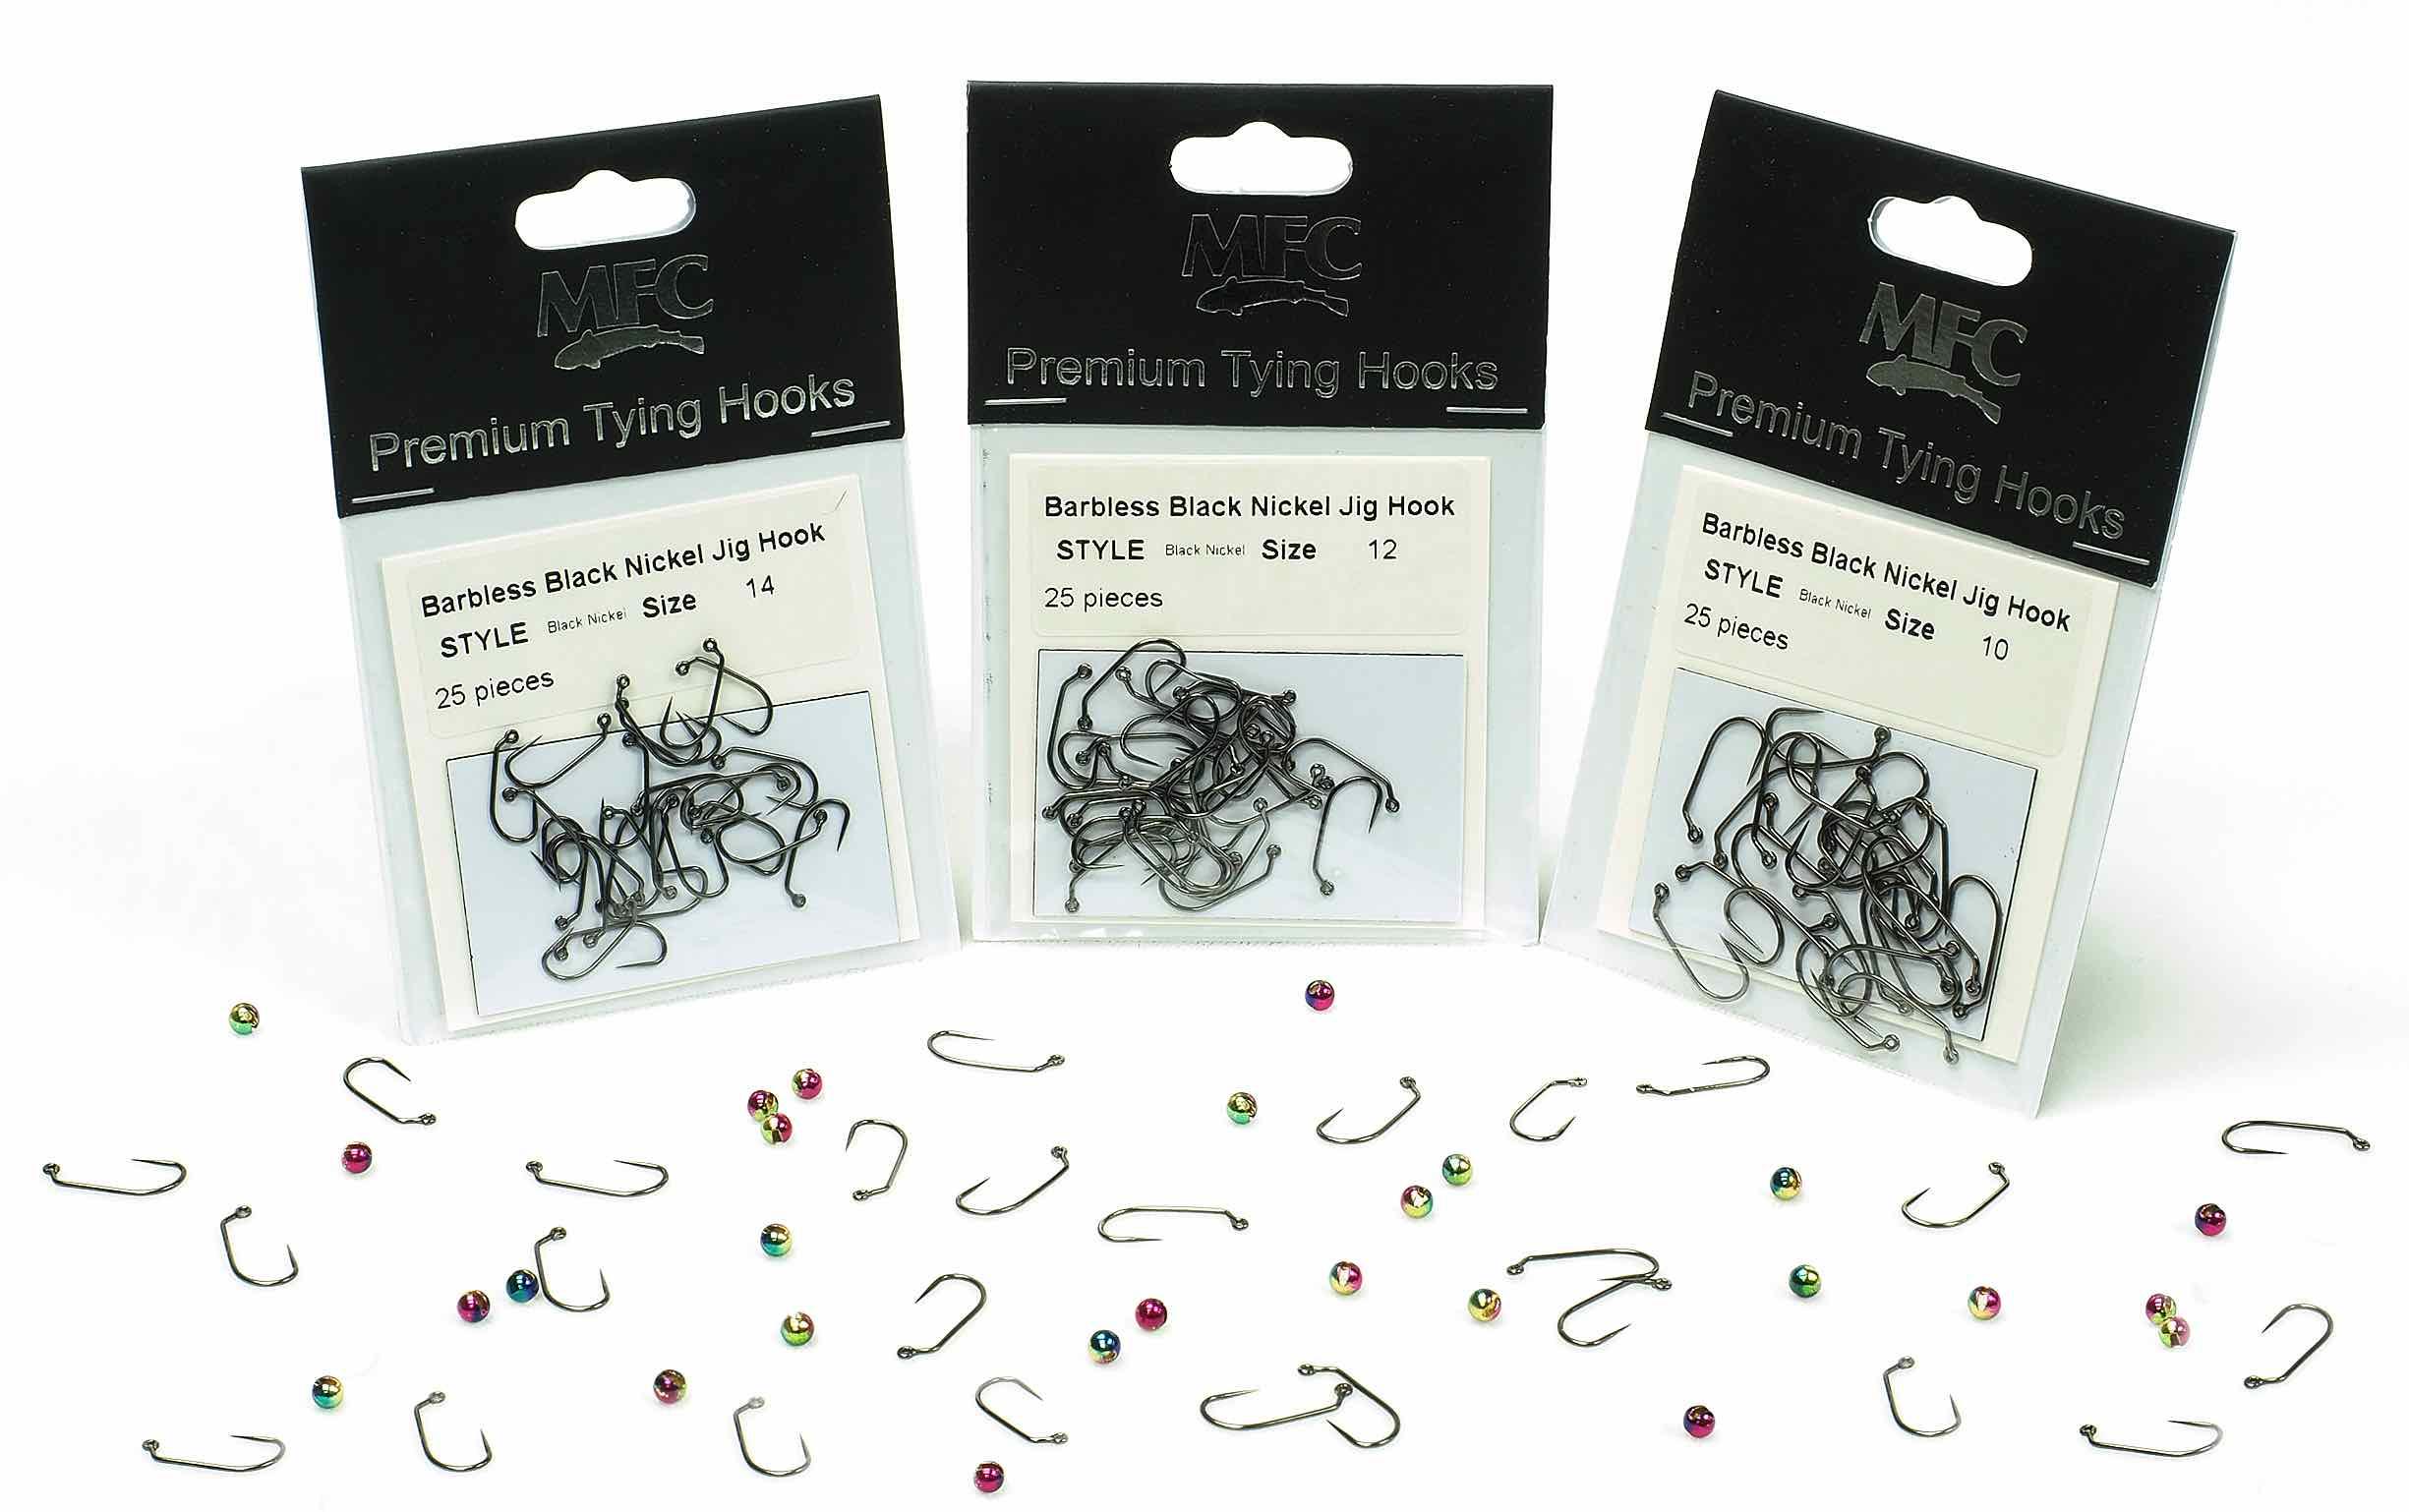 MFC - Montana Fly Company Premium Tying Hooks - Barbless Black Nickel Jig Hooks.